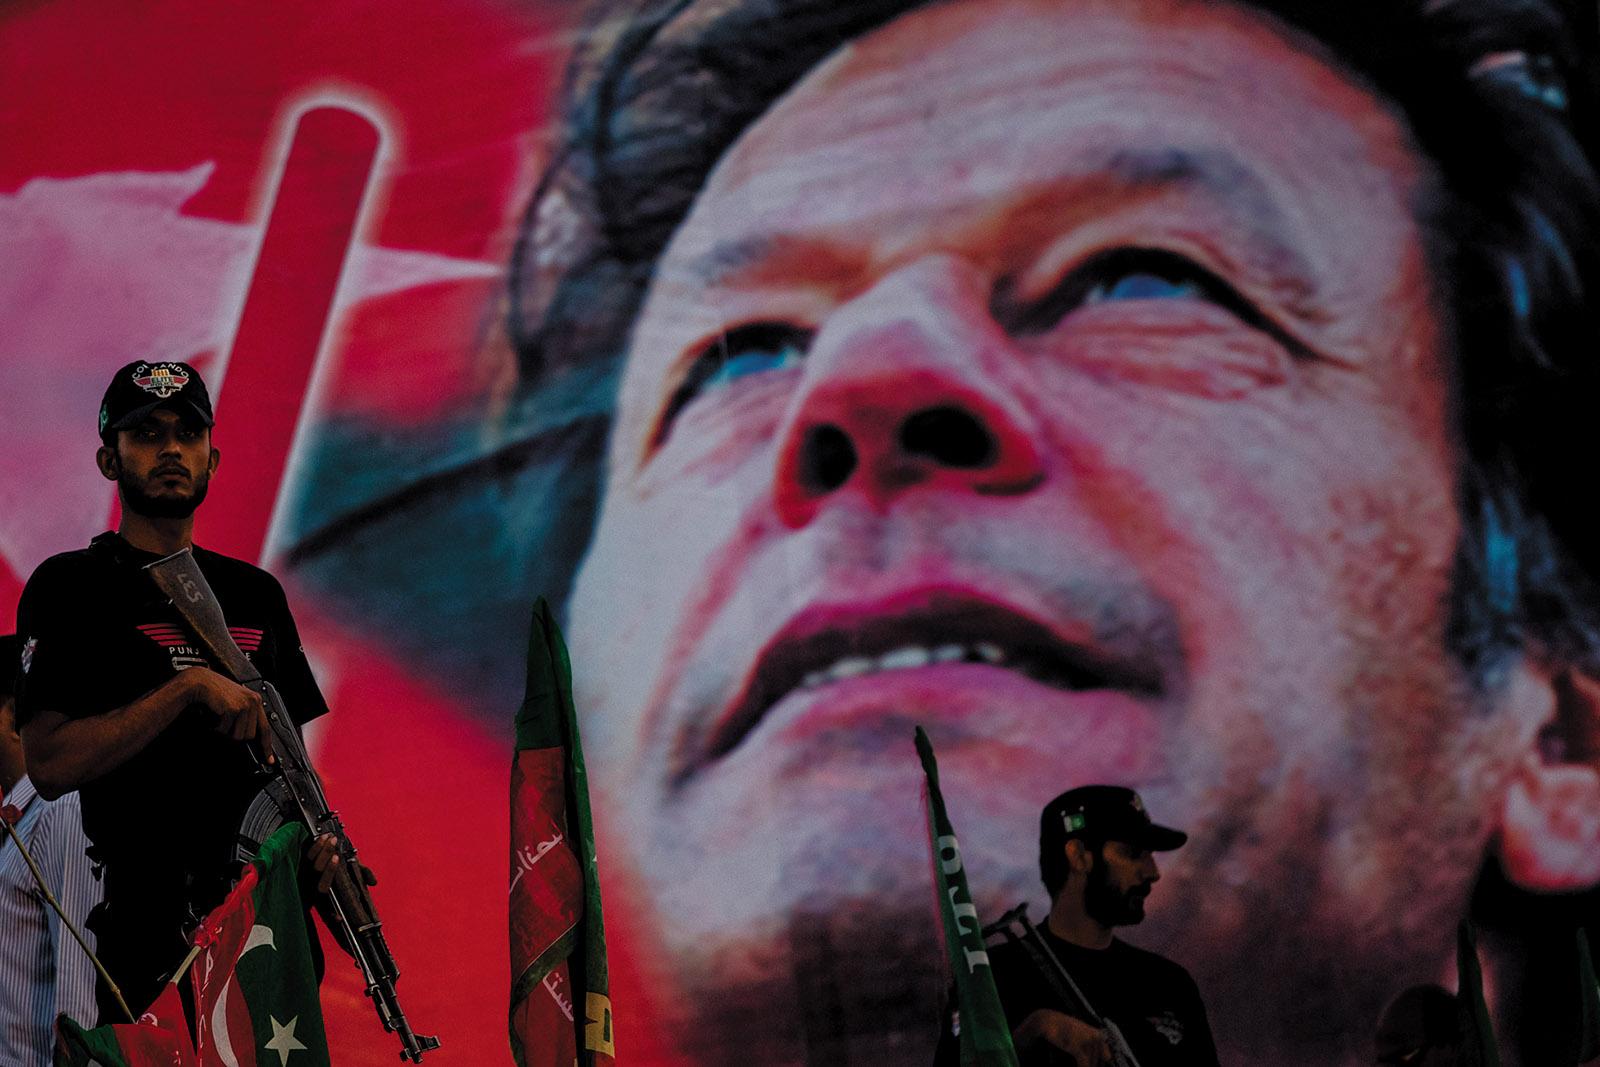 Punjabi police commandos standing guard at a political rally for Imran Khan, Faisalabad, Pakistan, May 2013